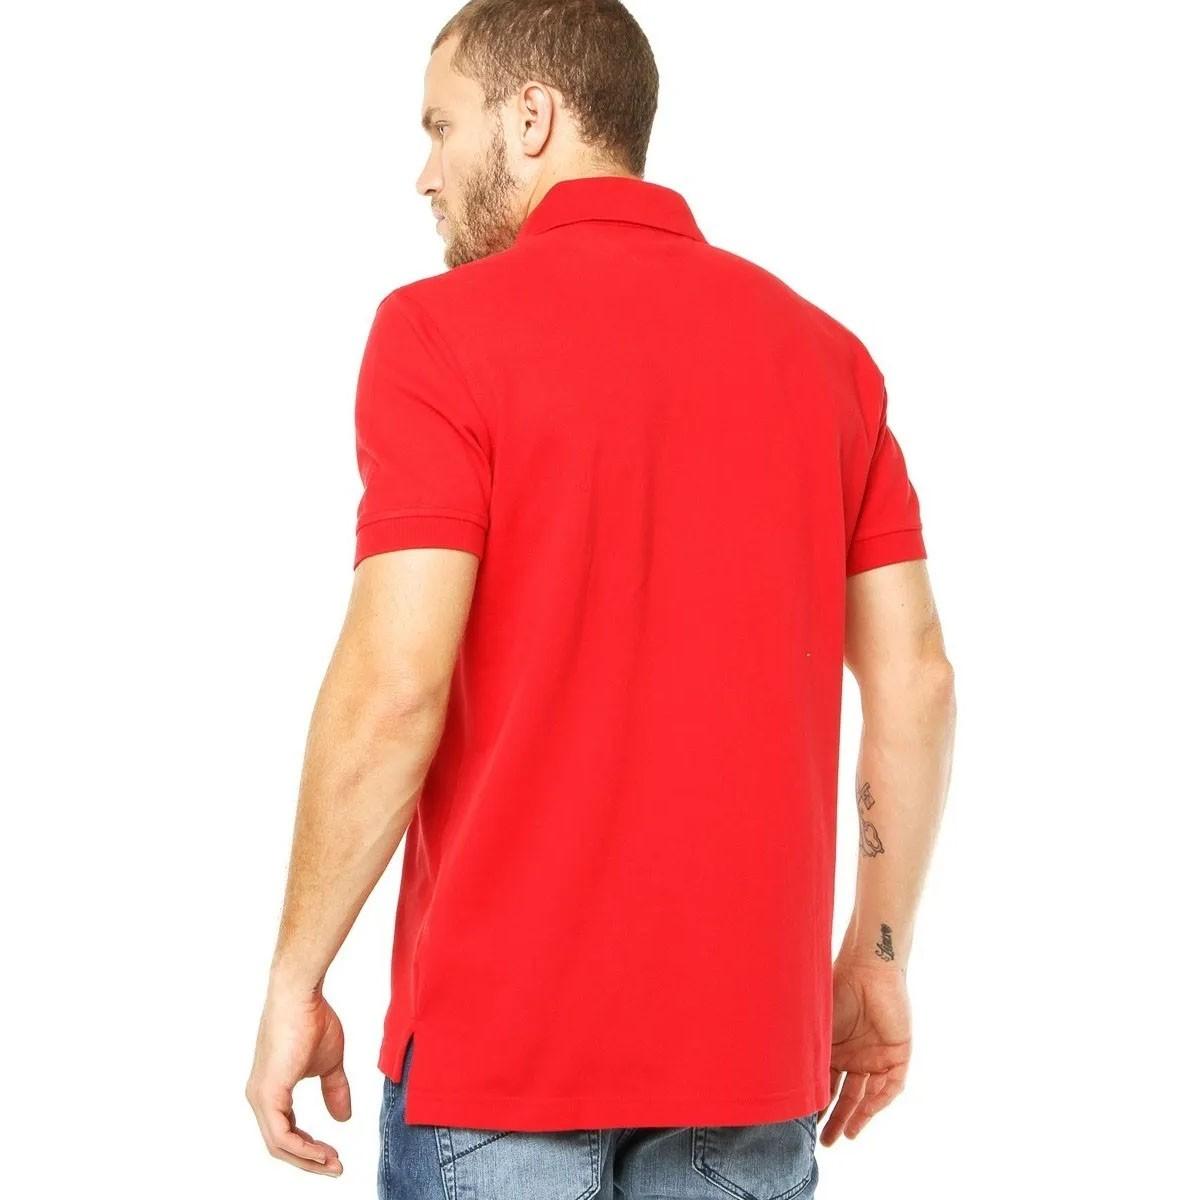 Camisa Polo Tommy Hilfiger Regular Vermelho